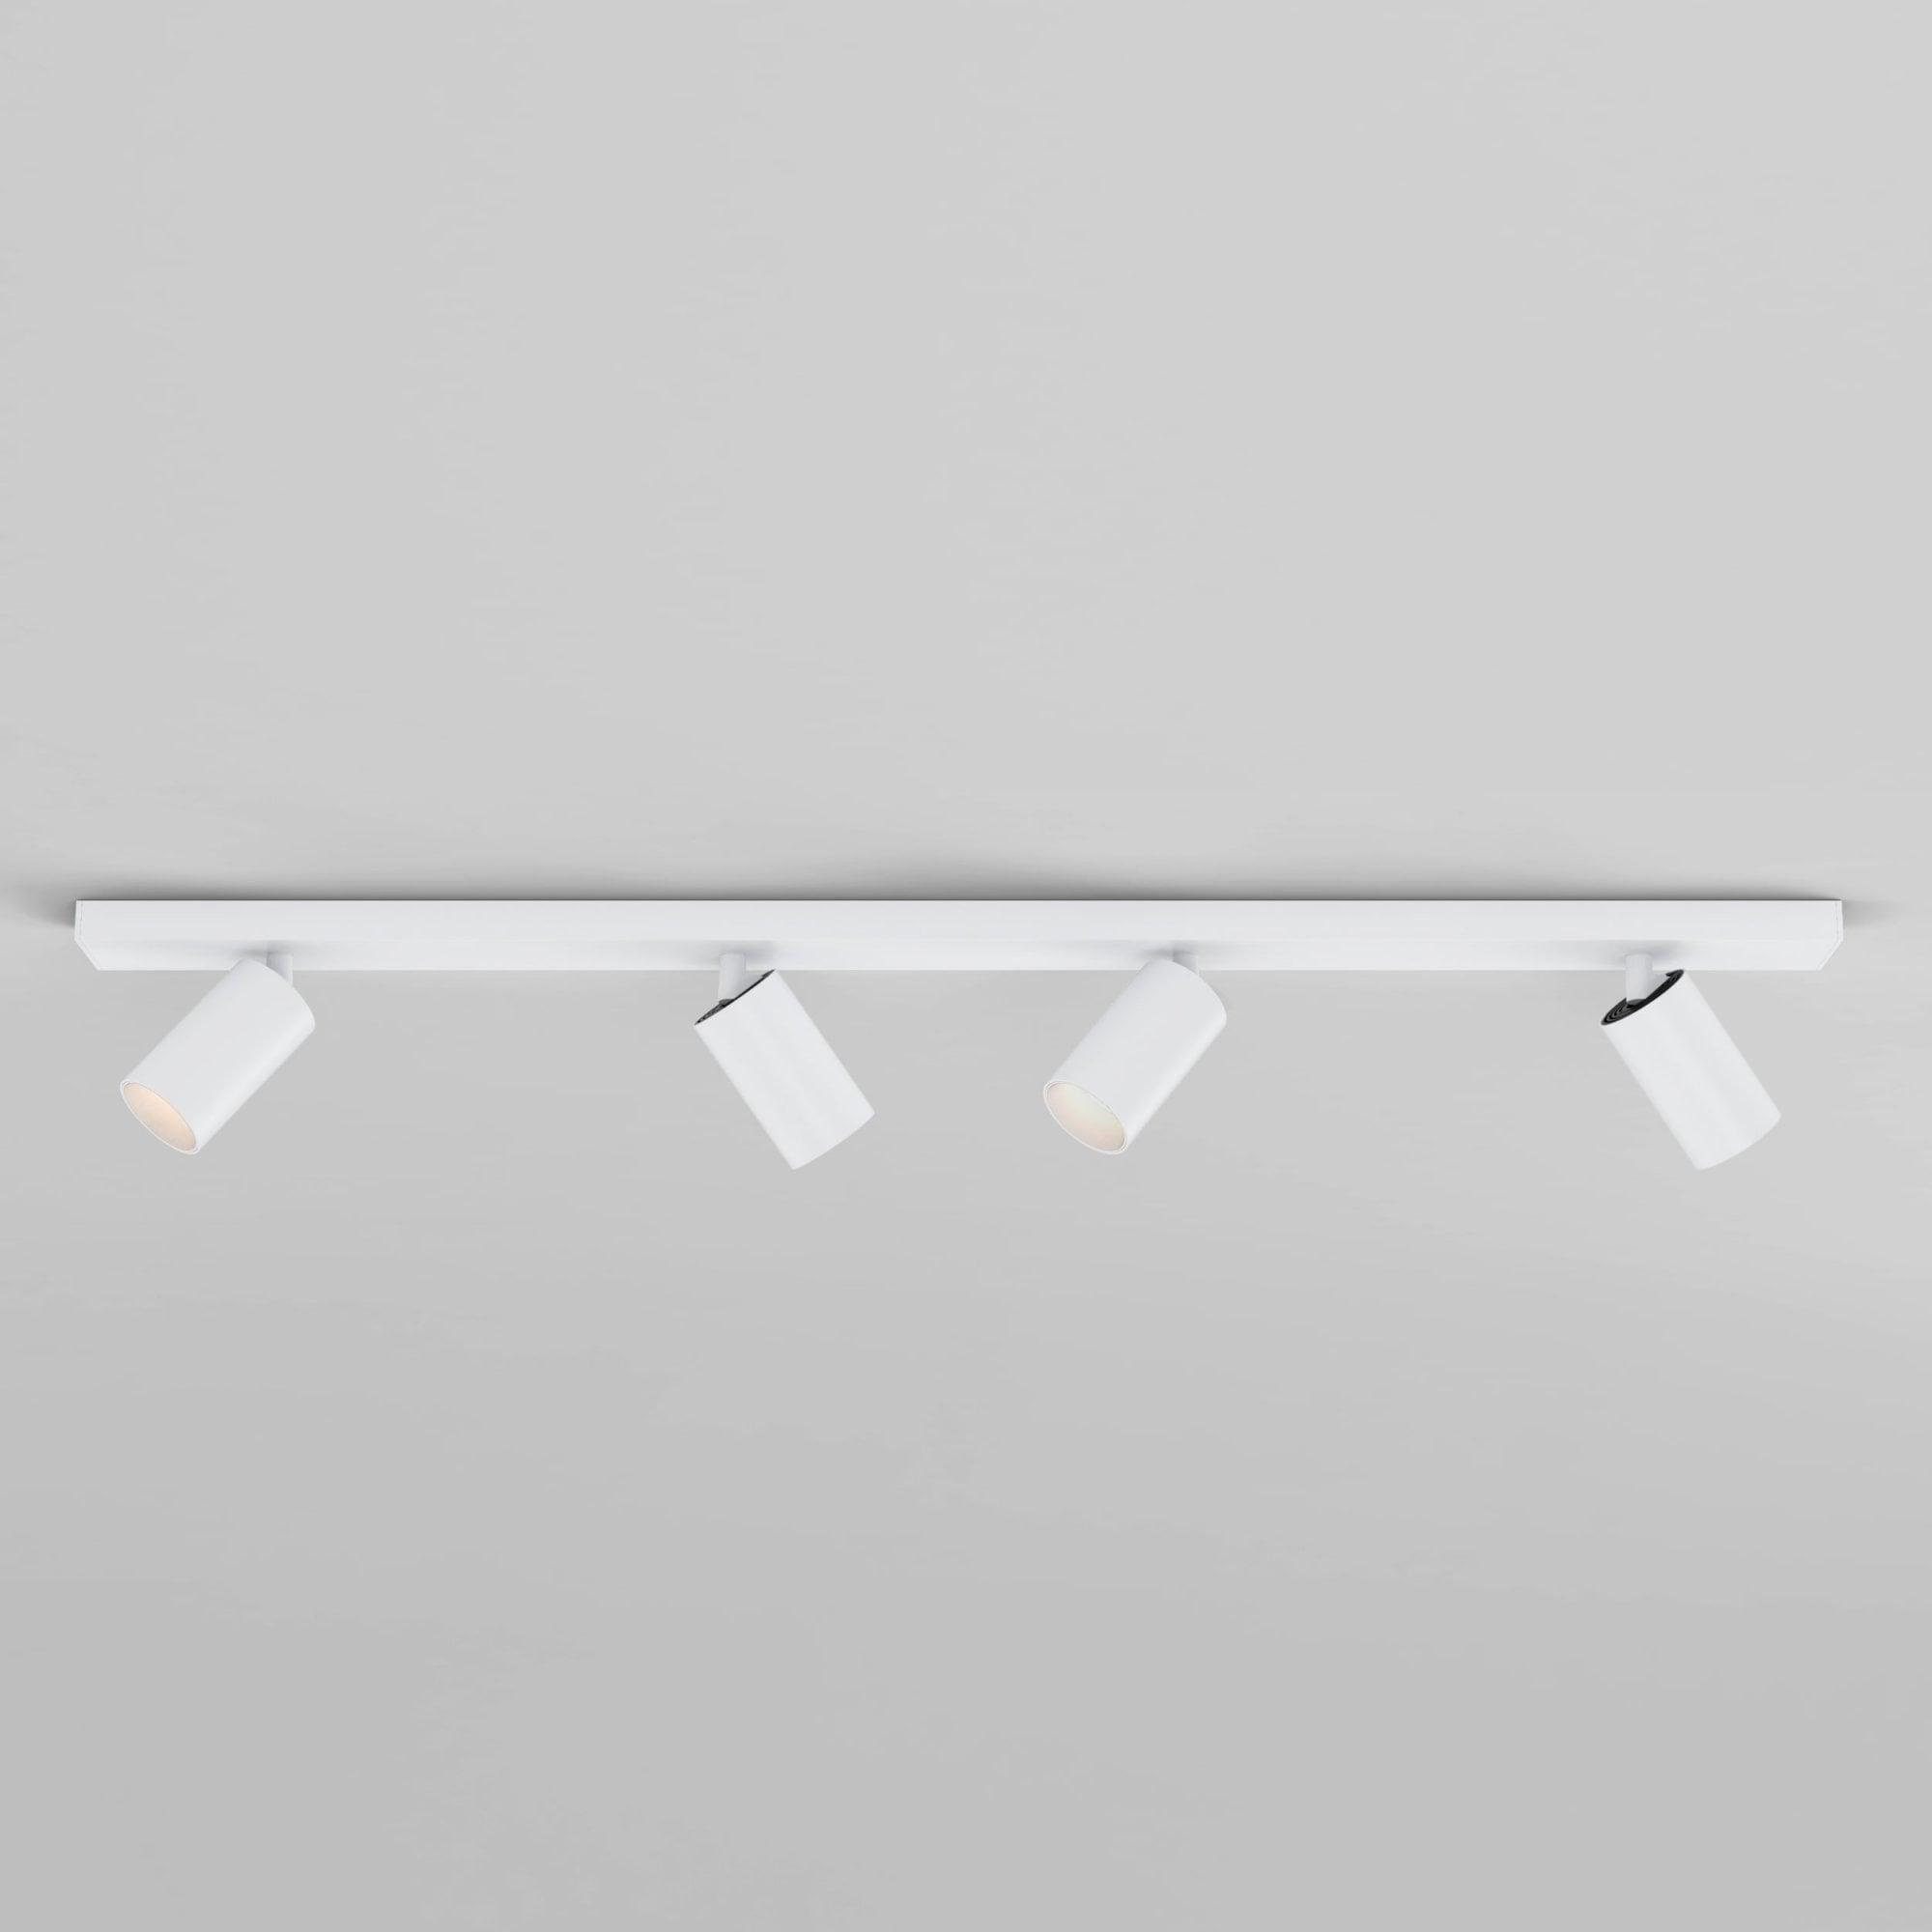 4X LED Floor Spotlight Stainless Steel Path Lighting Outdoor Light Recessed